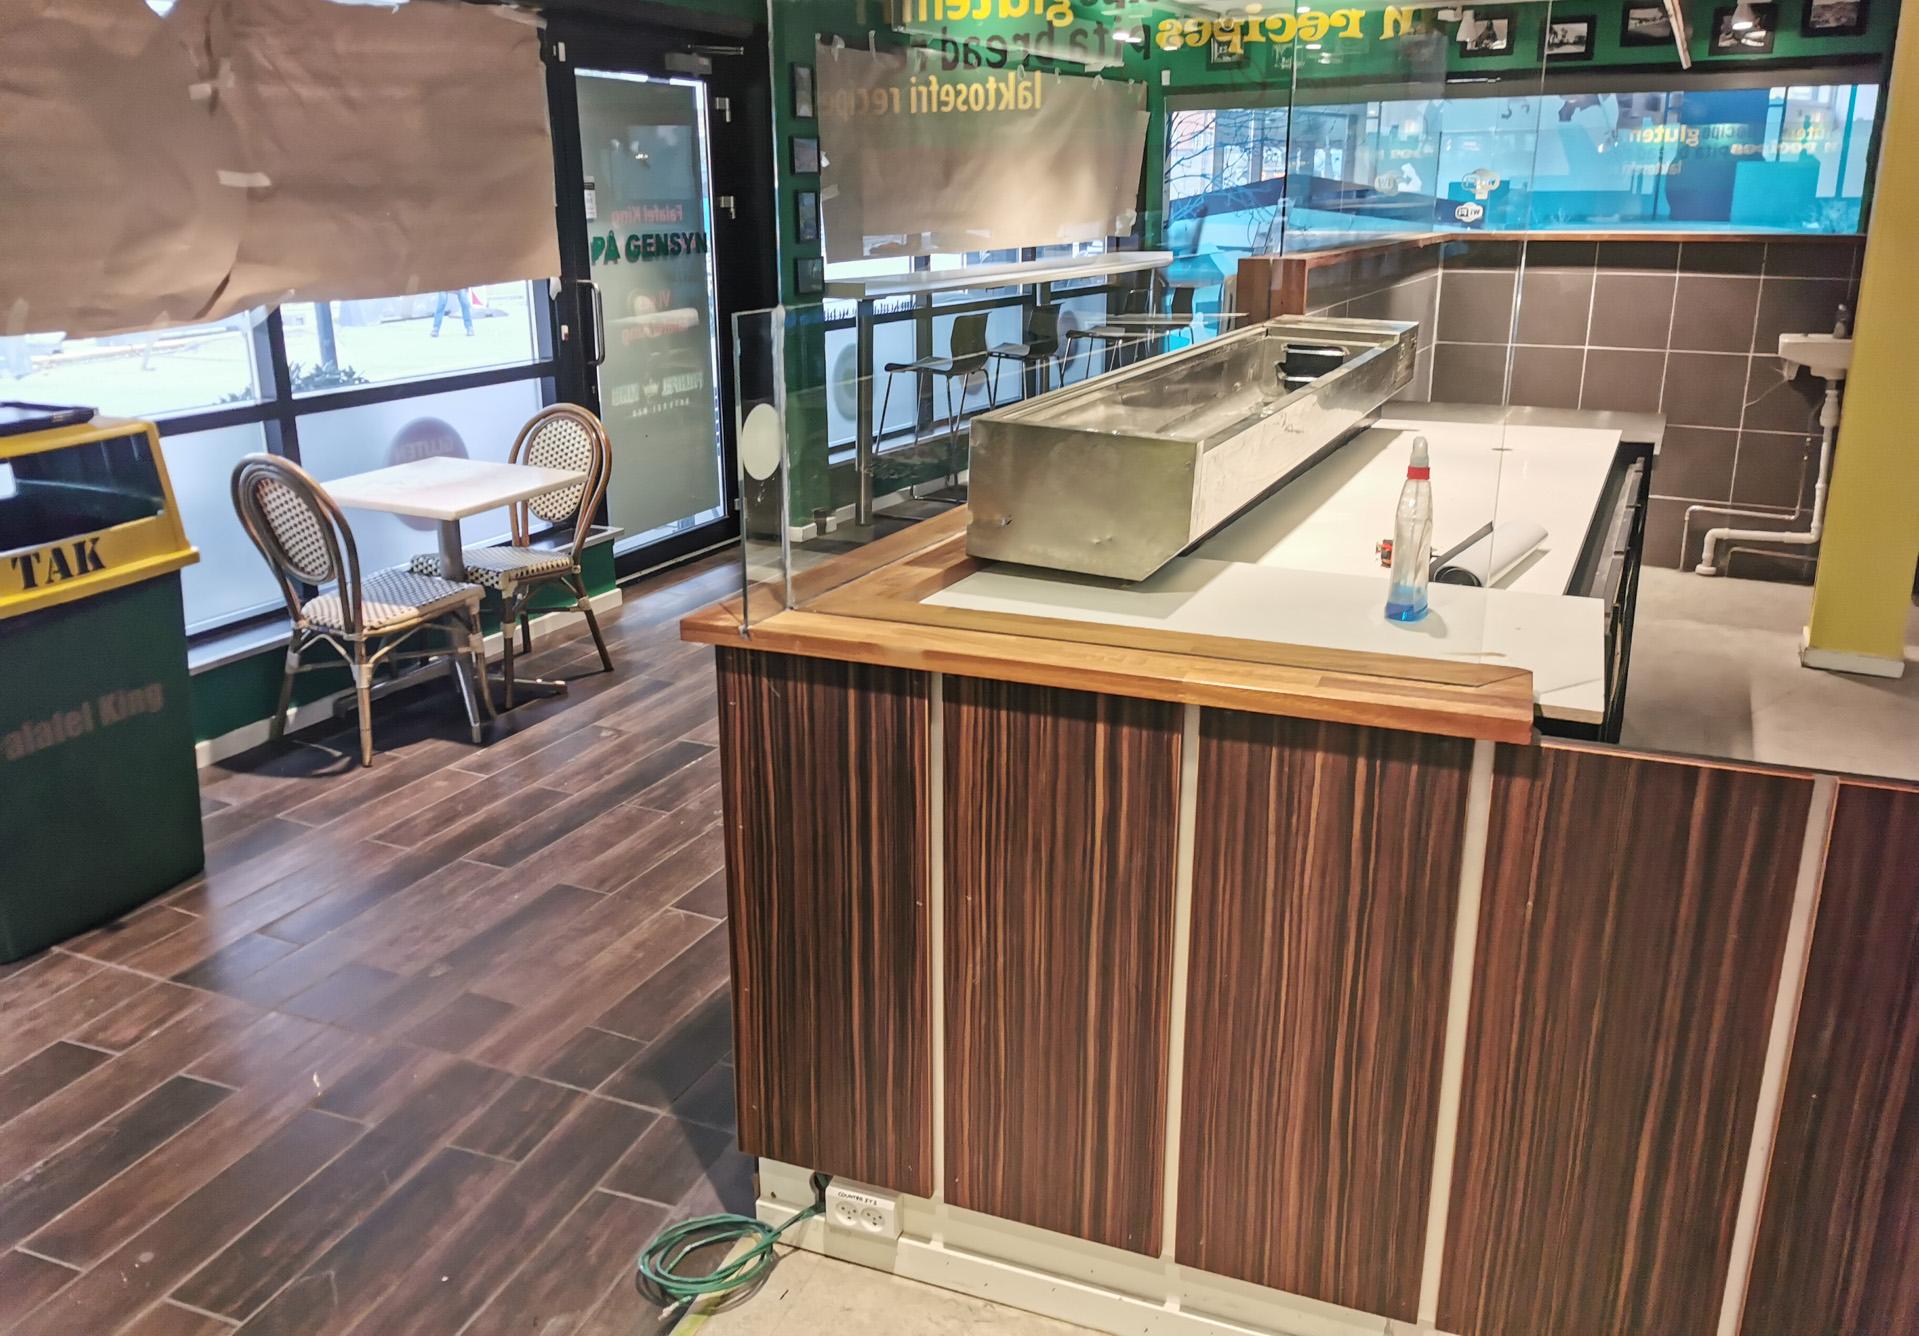 Rutebilstationen: Falafel Kongen udvider og flytter i større lokaler